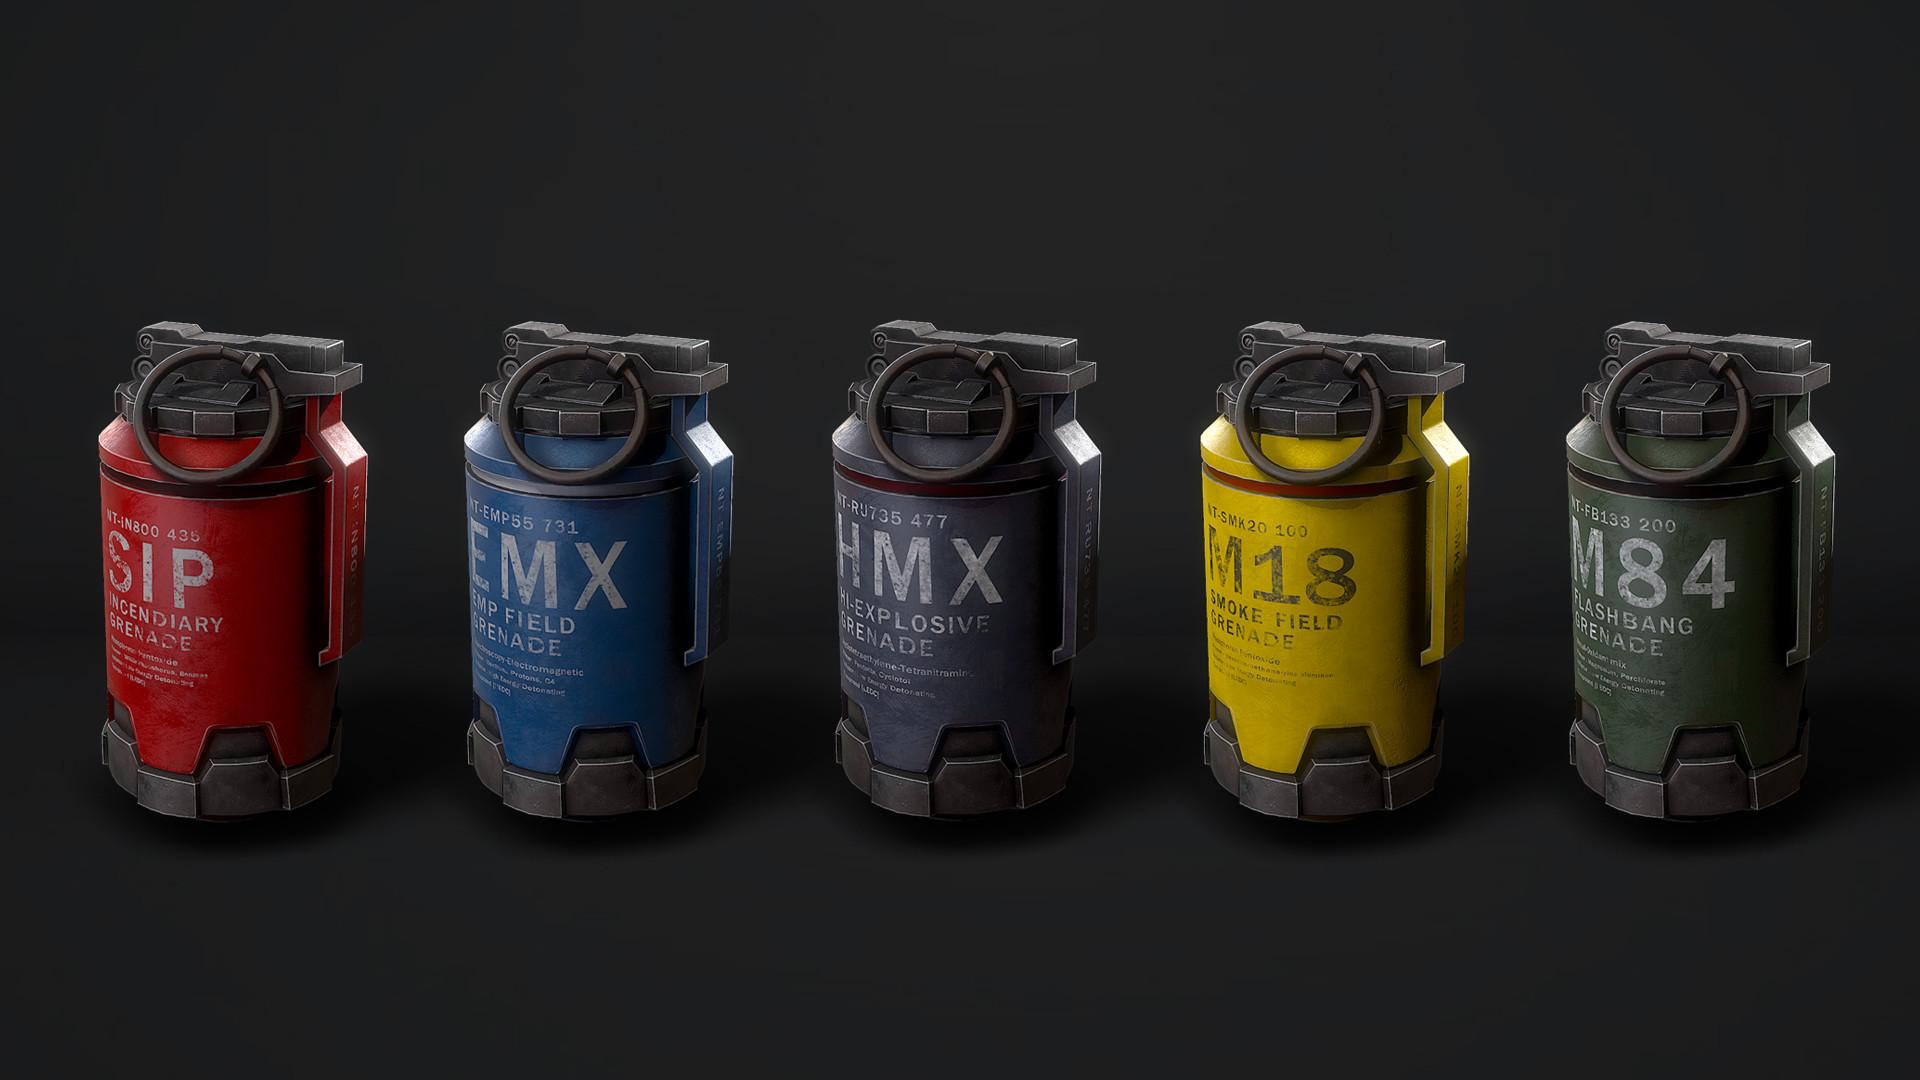 Marcelo m prado grenade cover